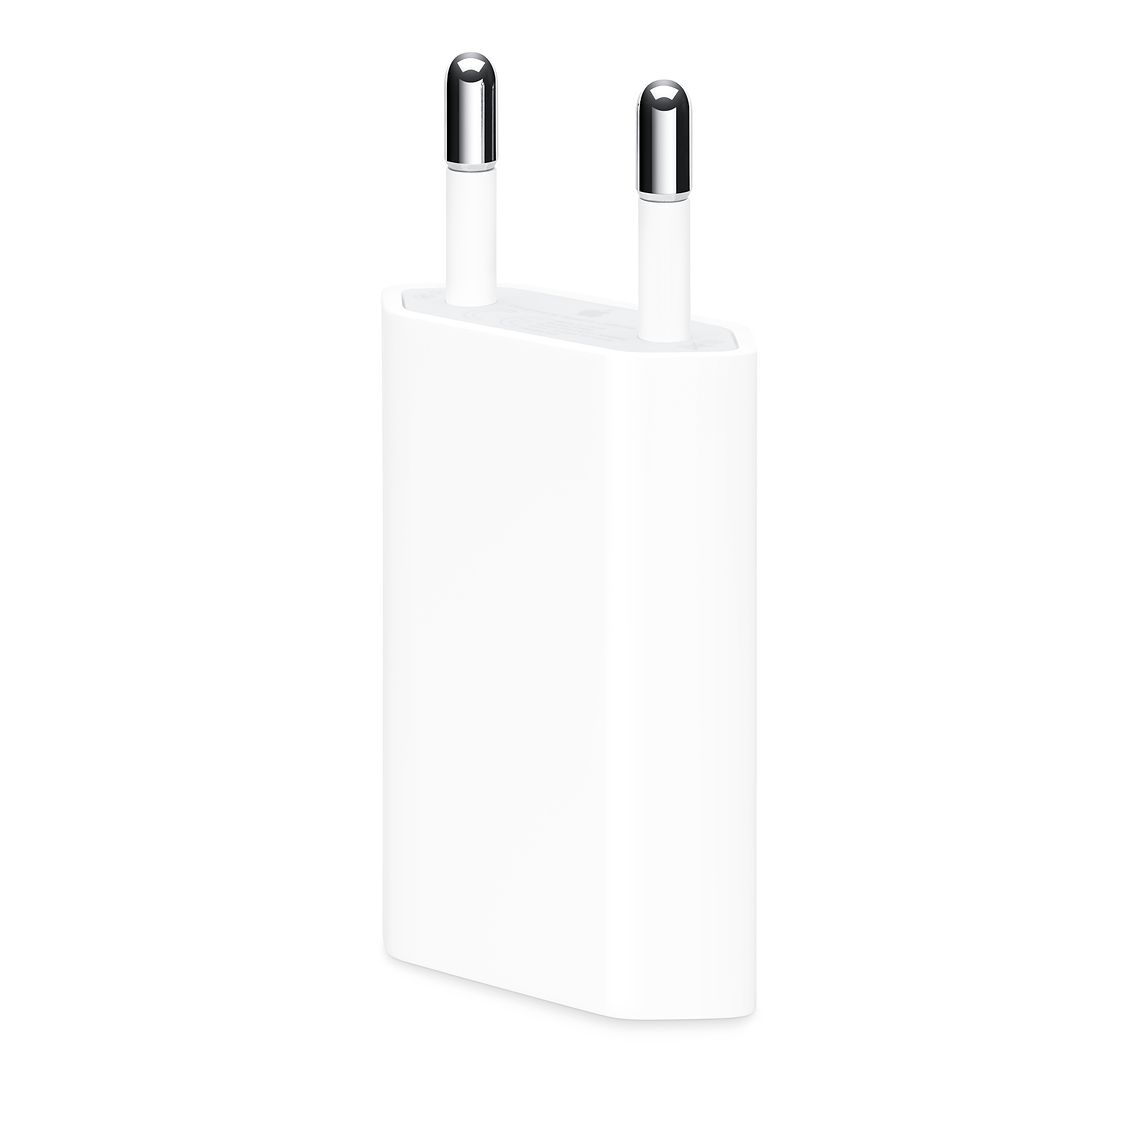 Apple USB-lichtnetadapter van 5W bulk image